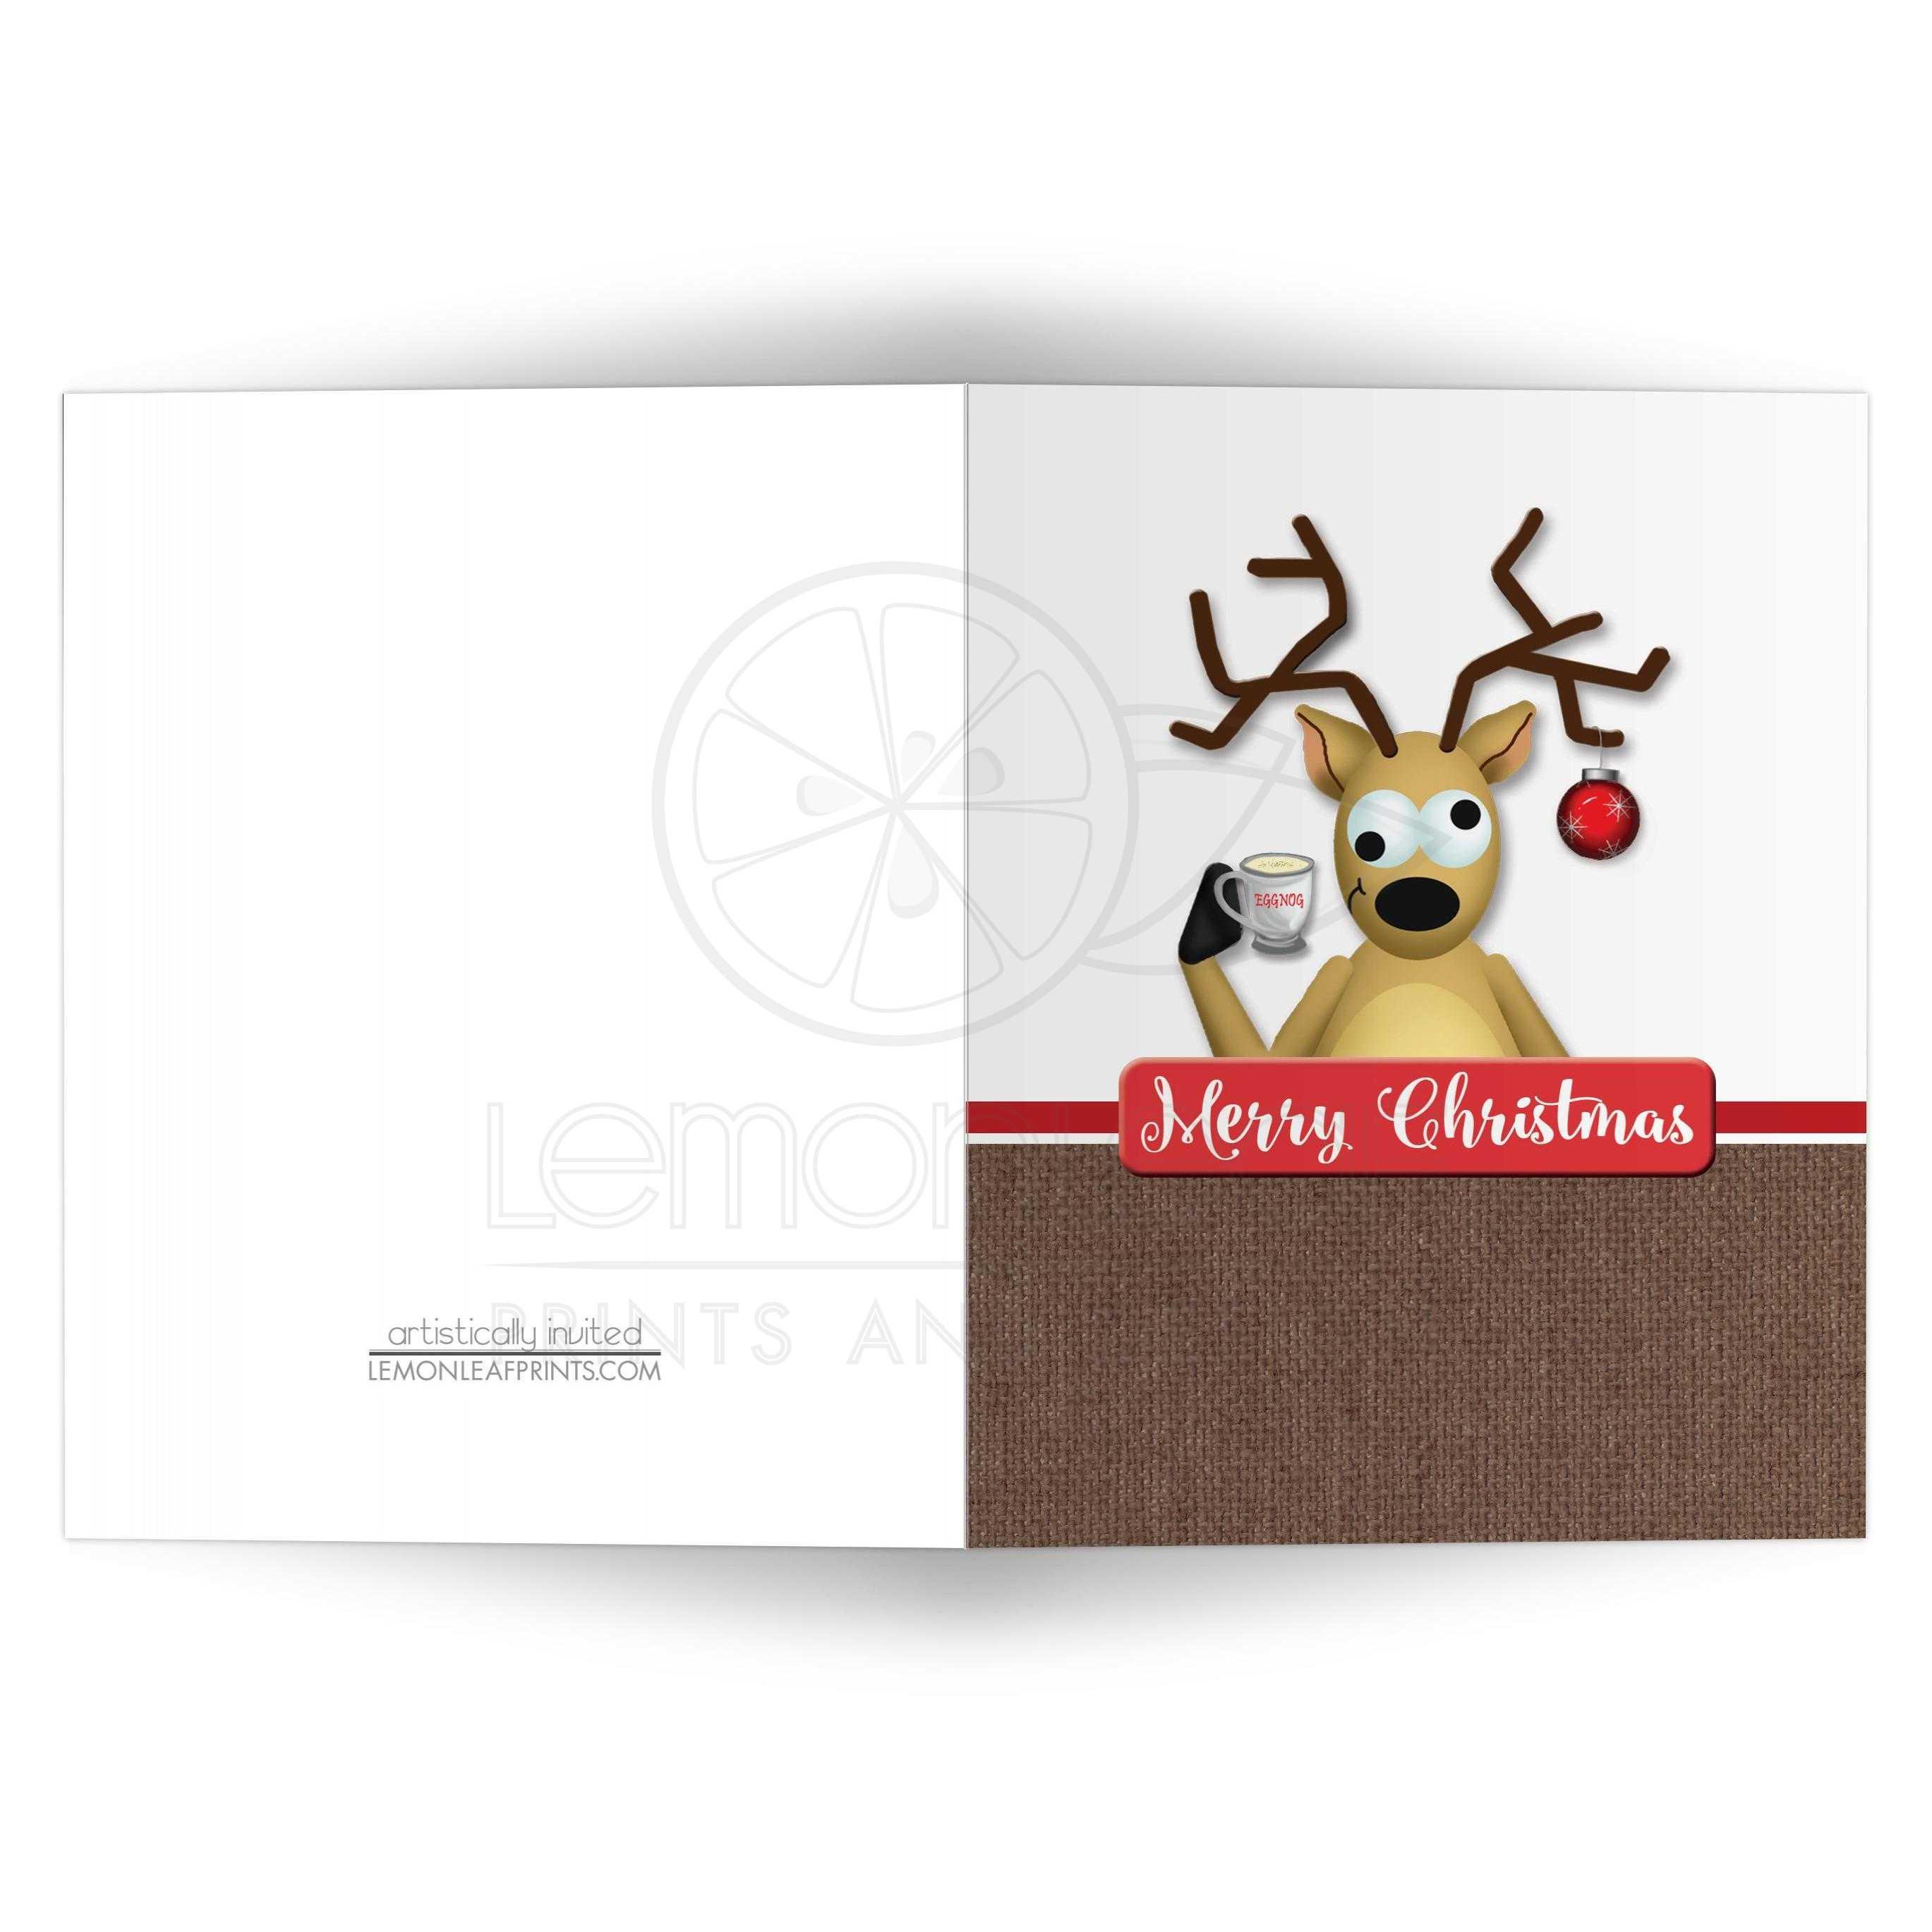 Christmas Cards - Funny Tipsy Reindeer Eggnog Merry Christmas